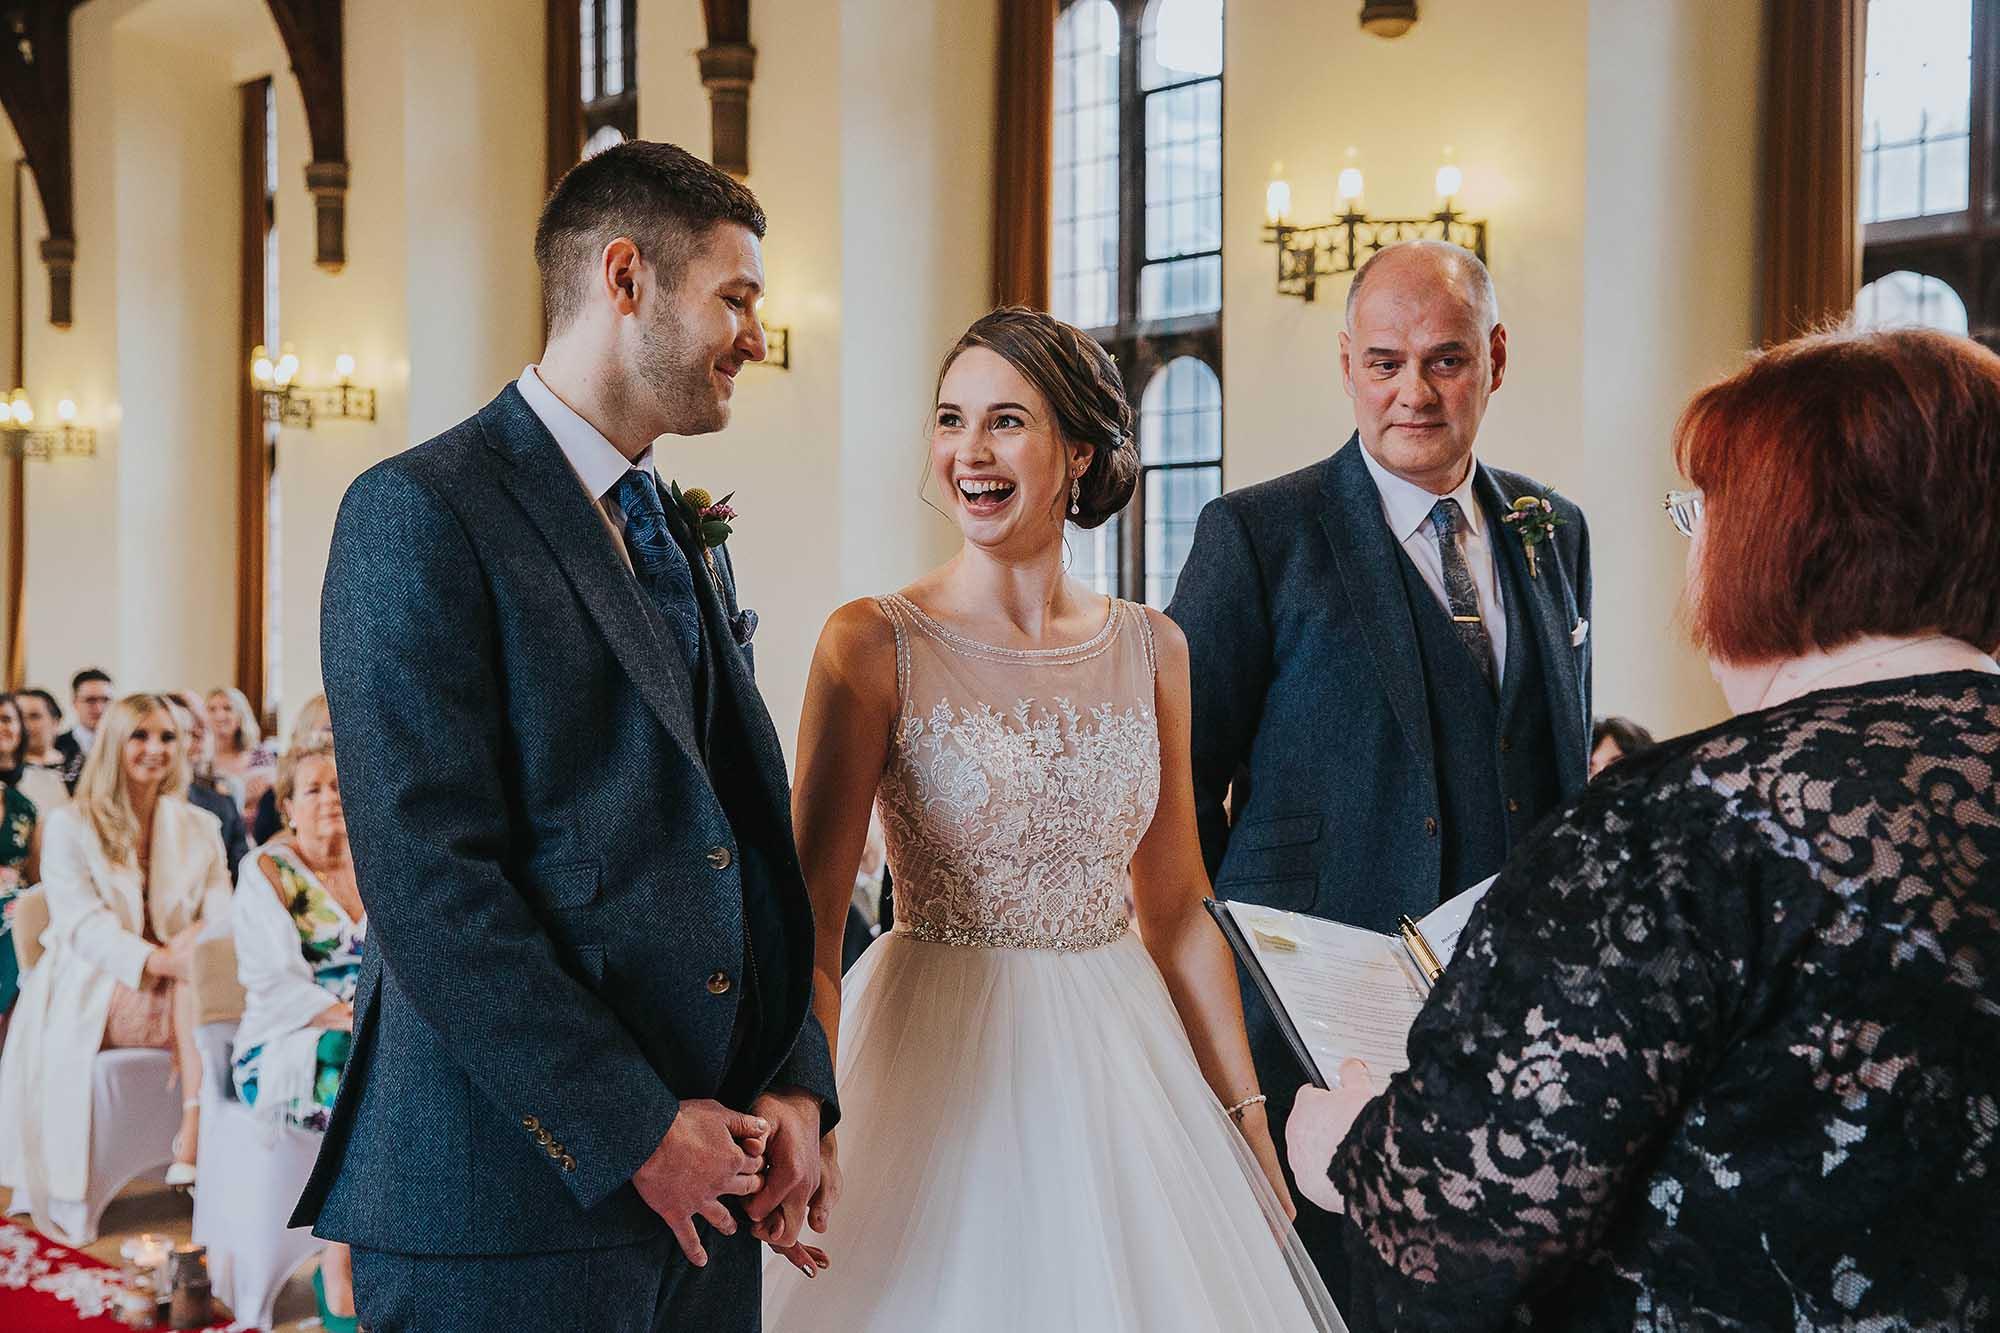 wedding service at Bolton School